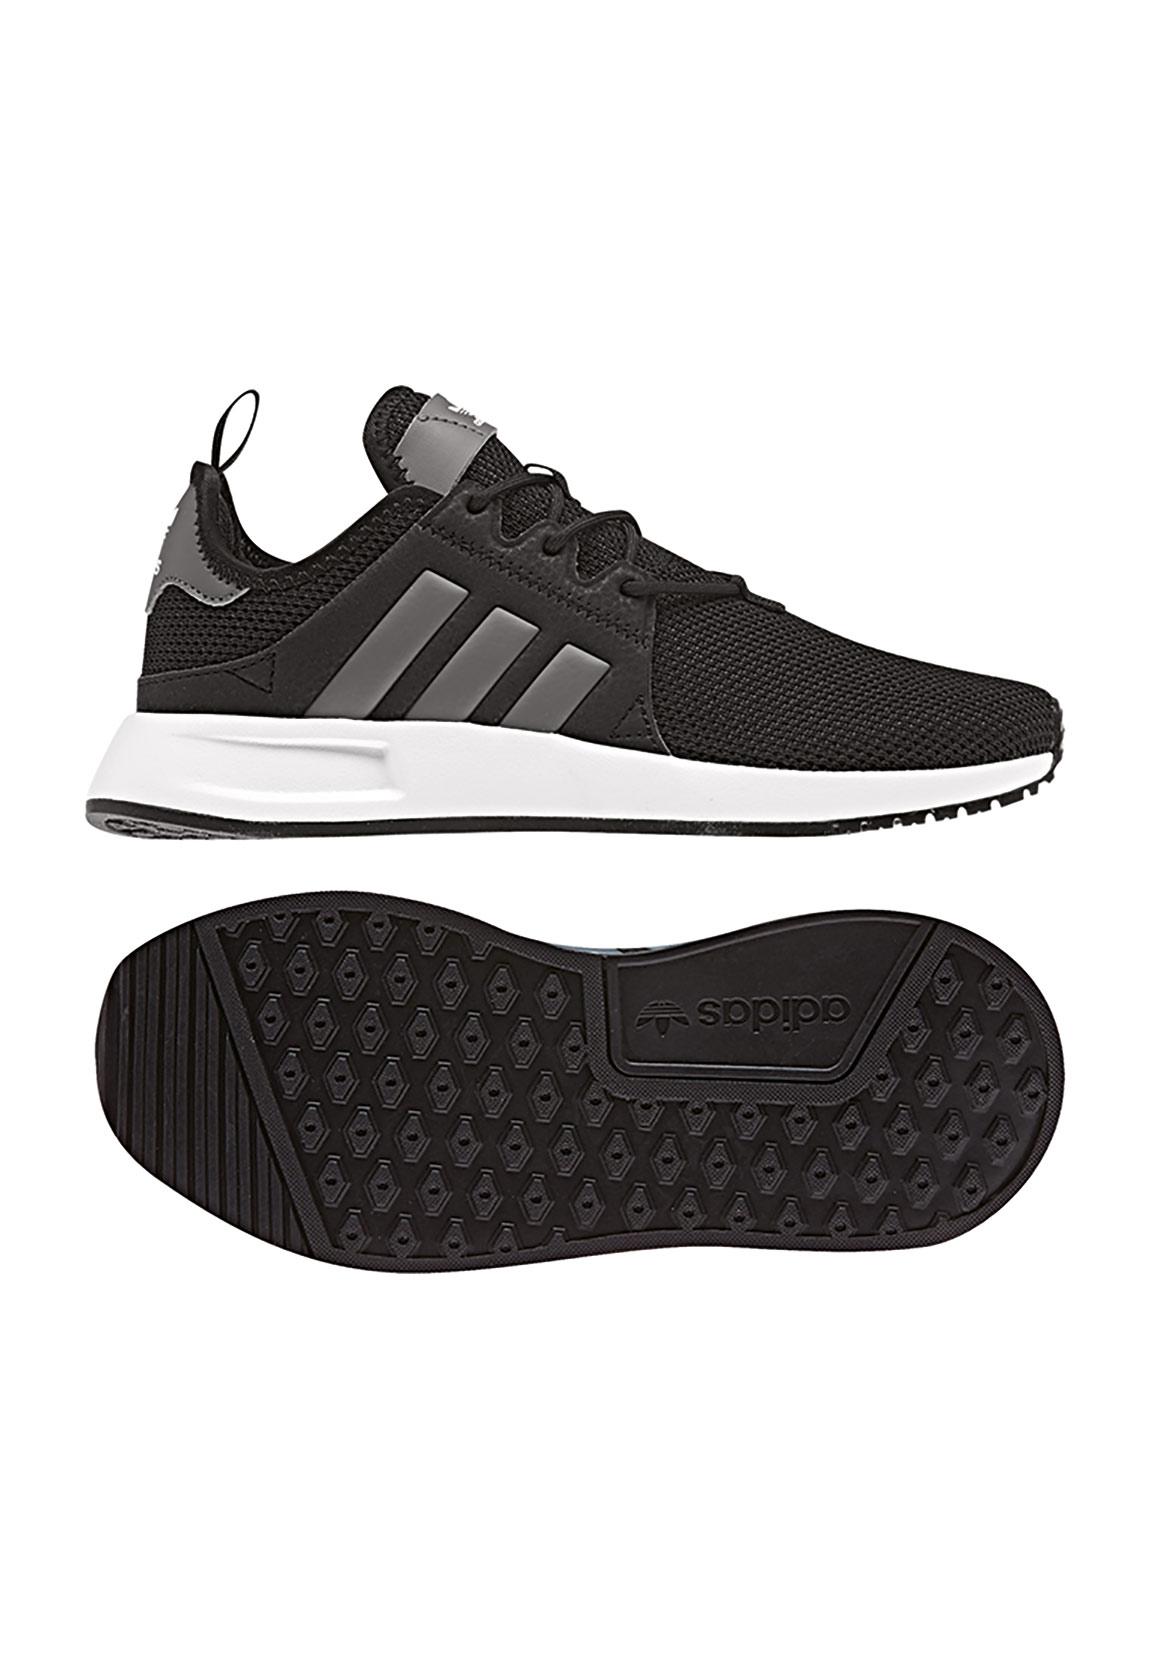 size 40 7174f c57ec Adidas Originals Sneaker X_PLR CG6825 Schwarz Weiss